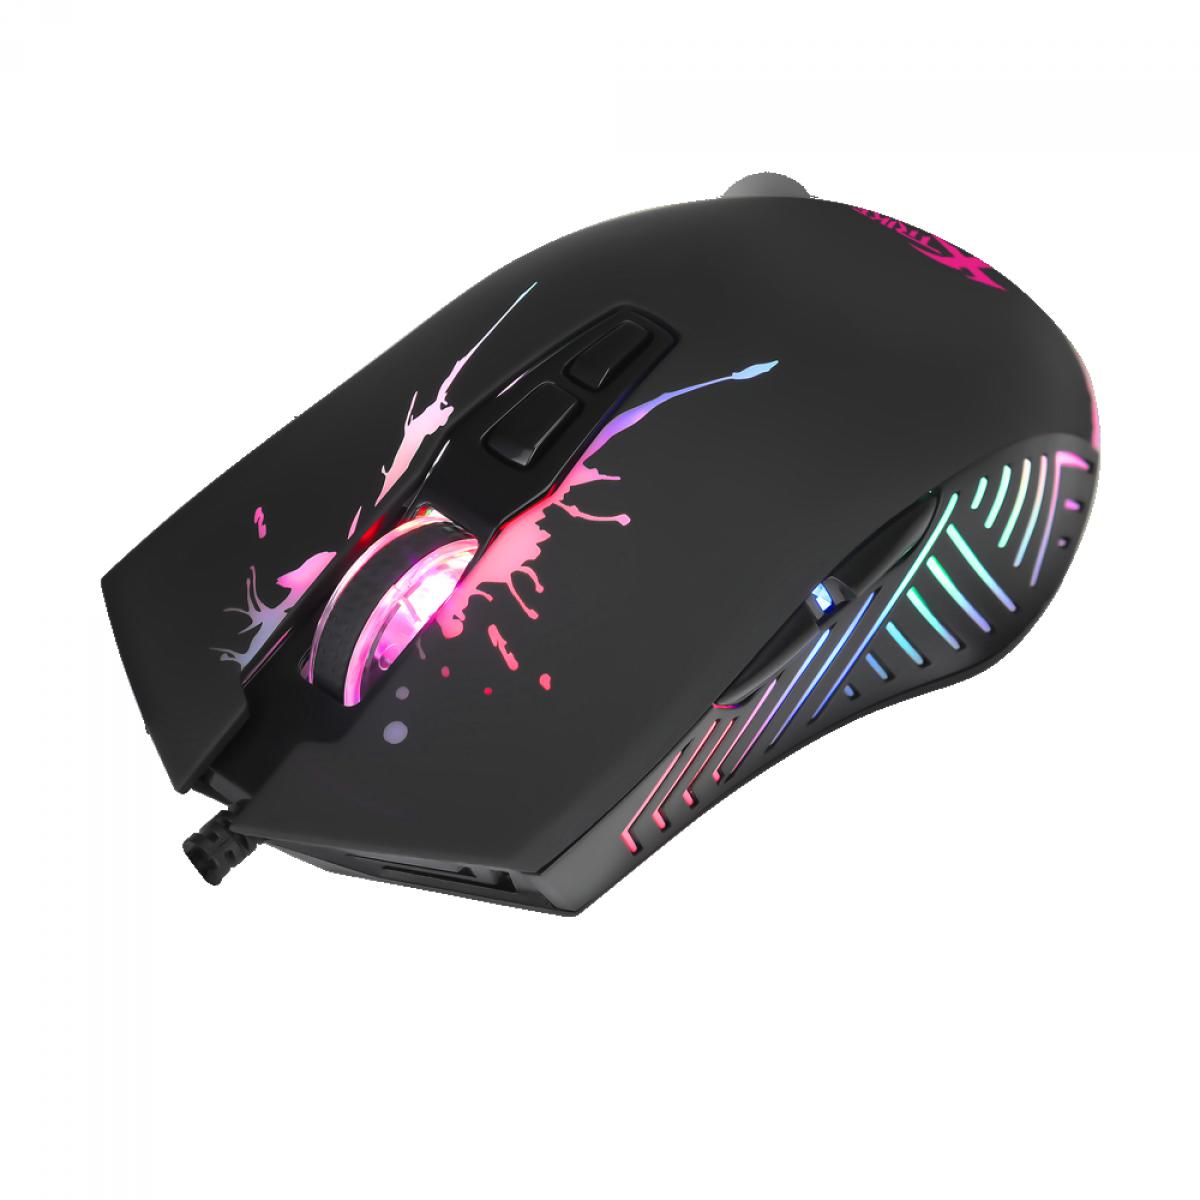 Mouse Gamer Xtrike Me GM-215, 7200DPI, 7 Botões Programáveis, RGB, Black